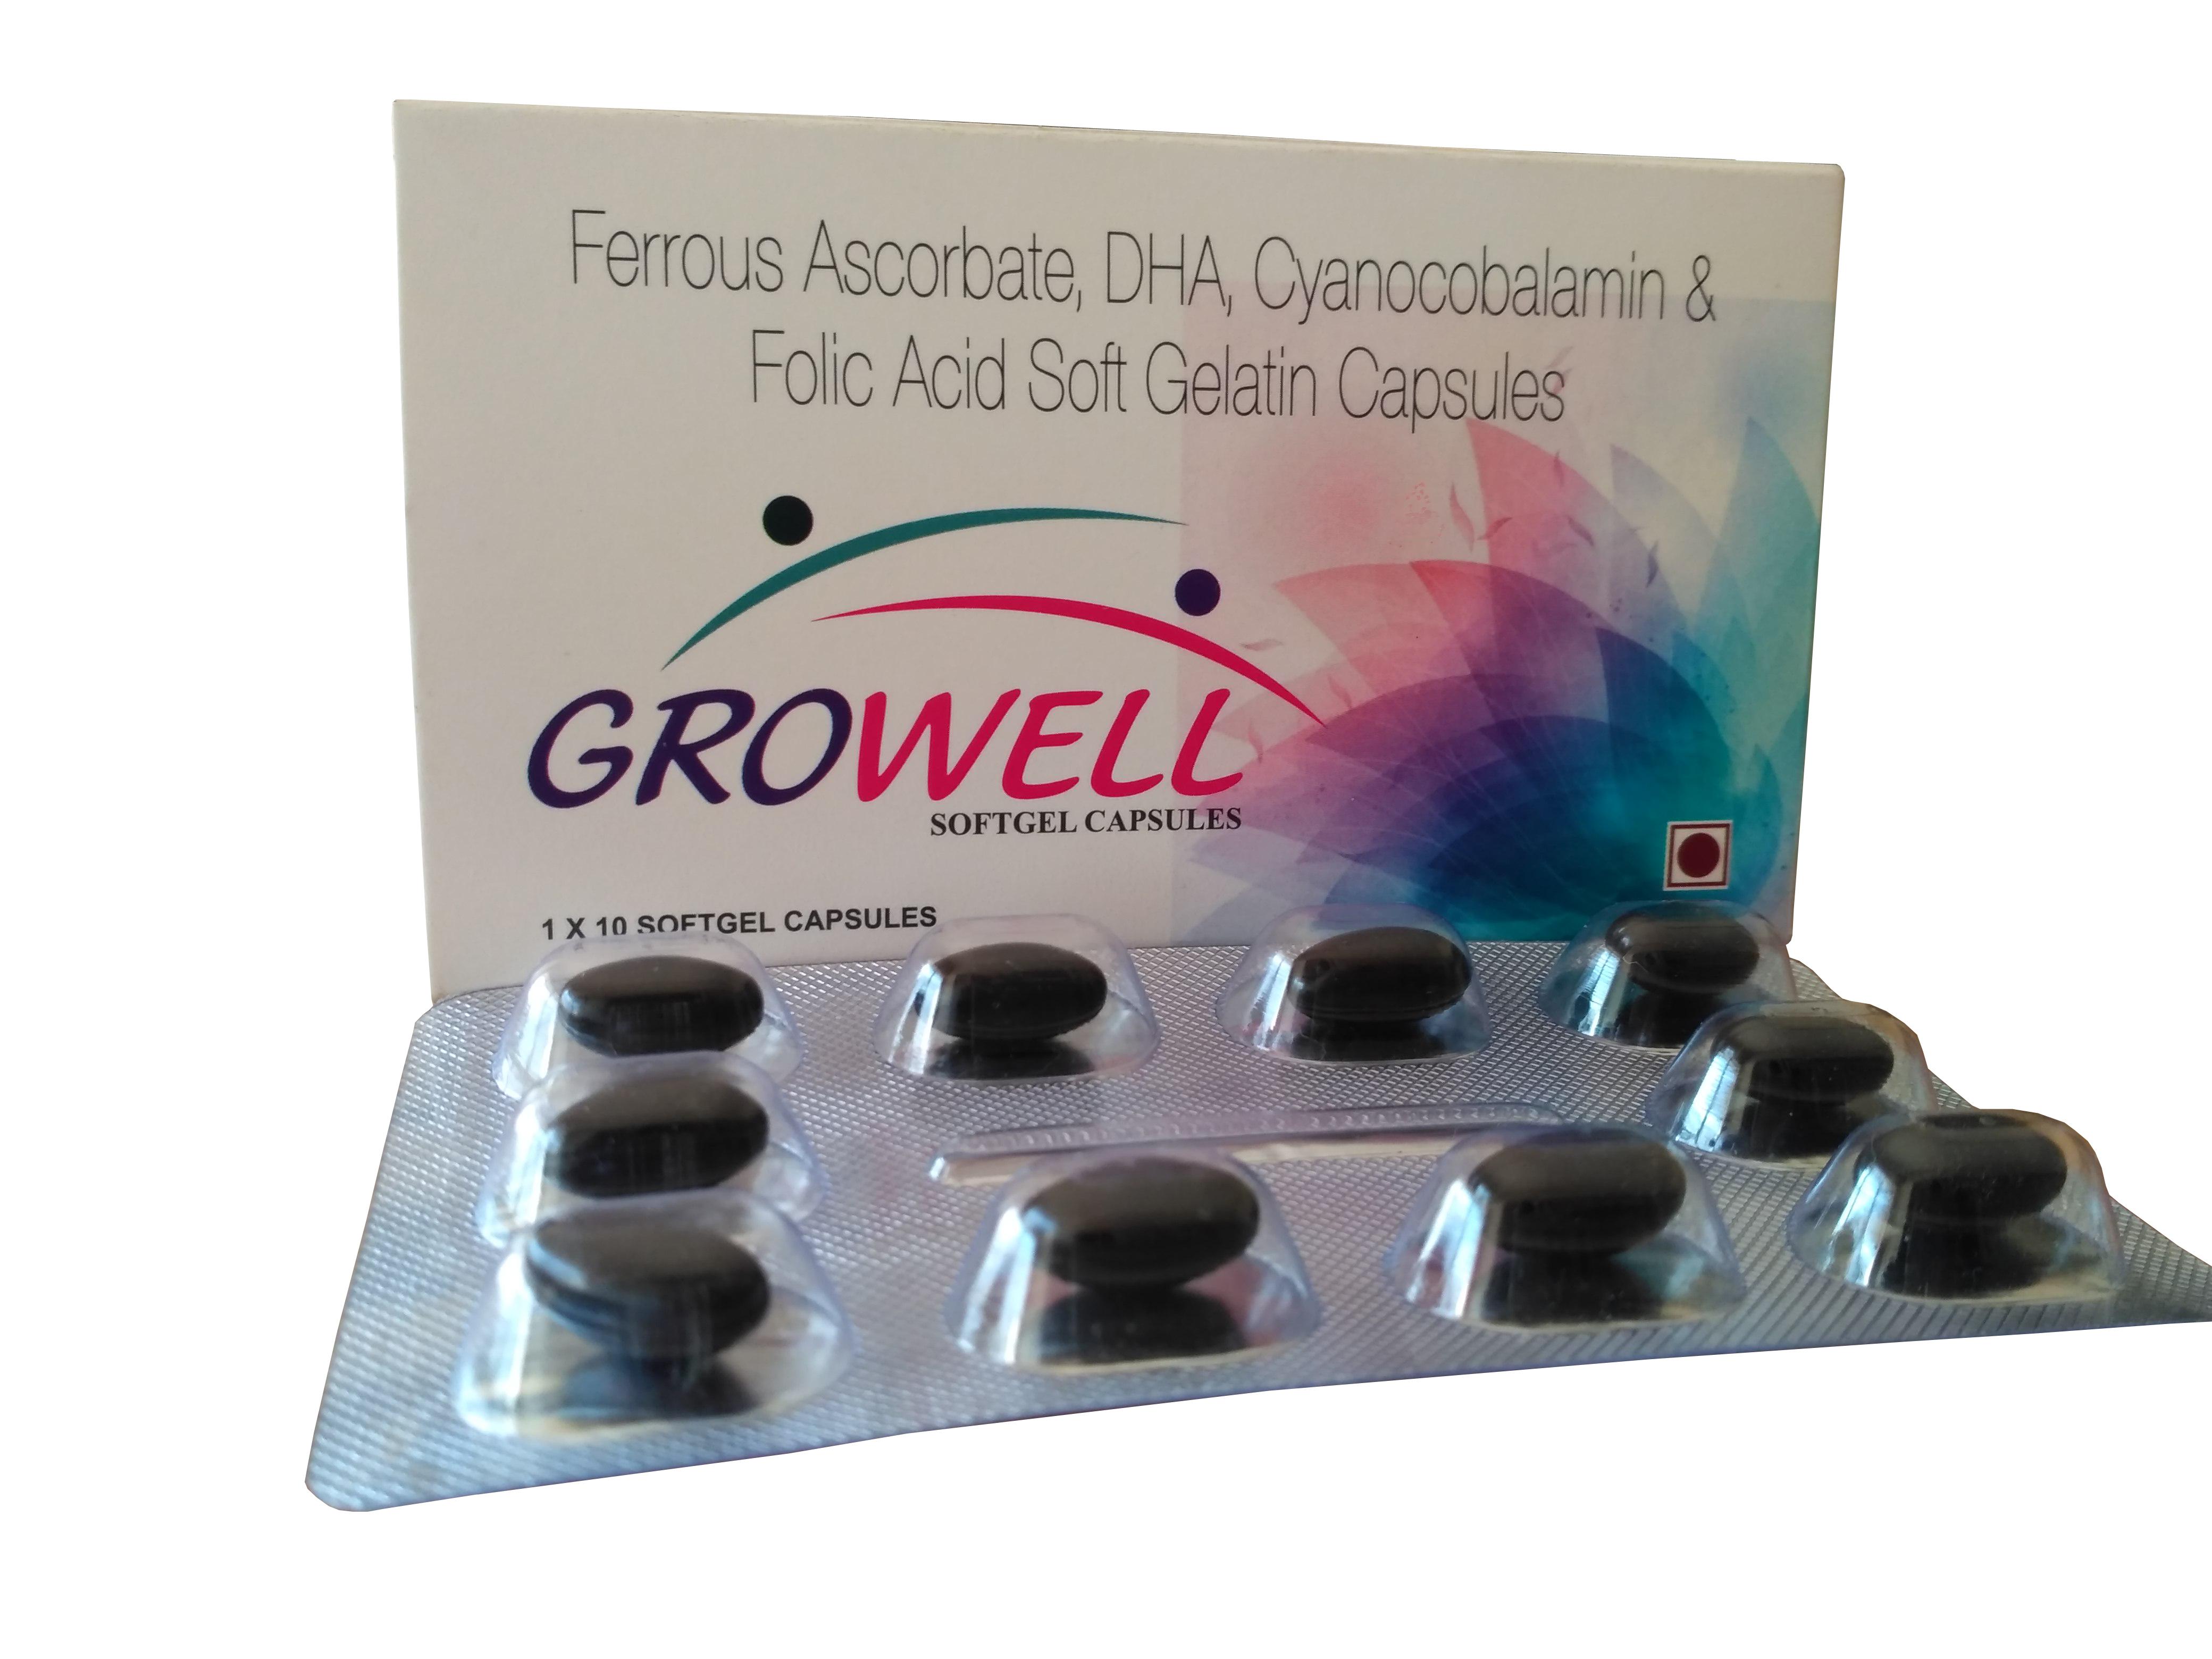 DHA 40% 200 mg + Cynocobalamin 0.0075mg , Folic Acid 1.5mg,Ferrous Ascorbate 50mg